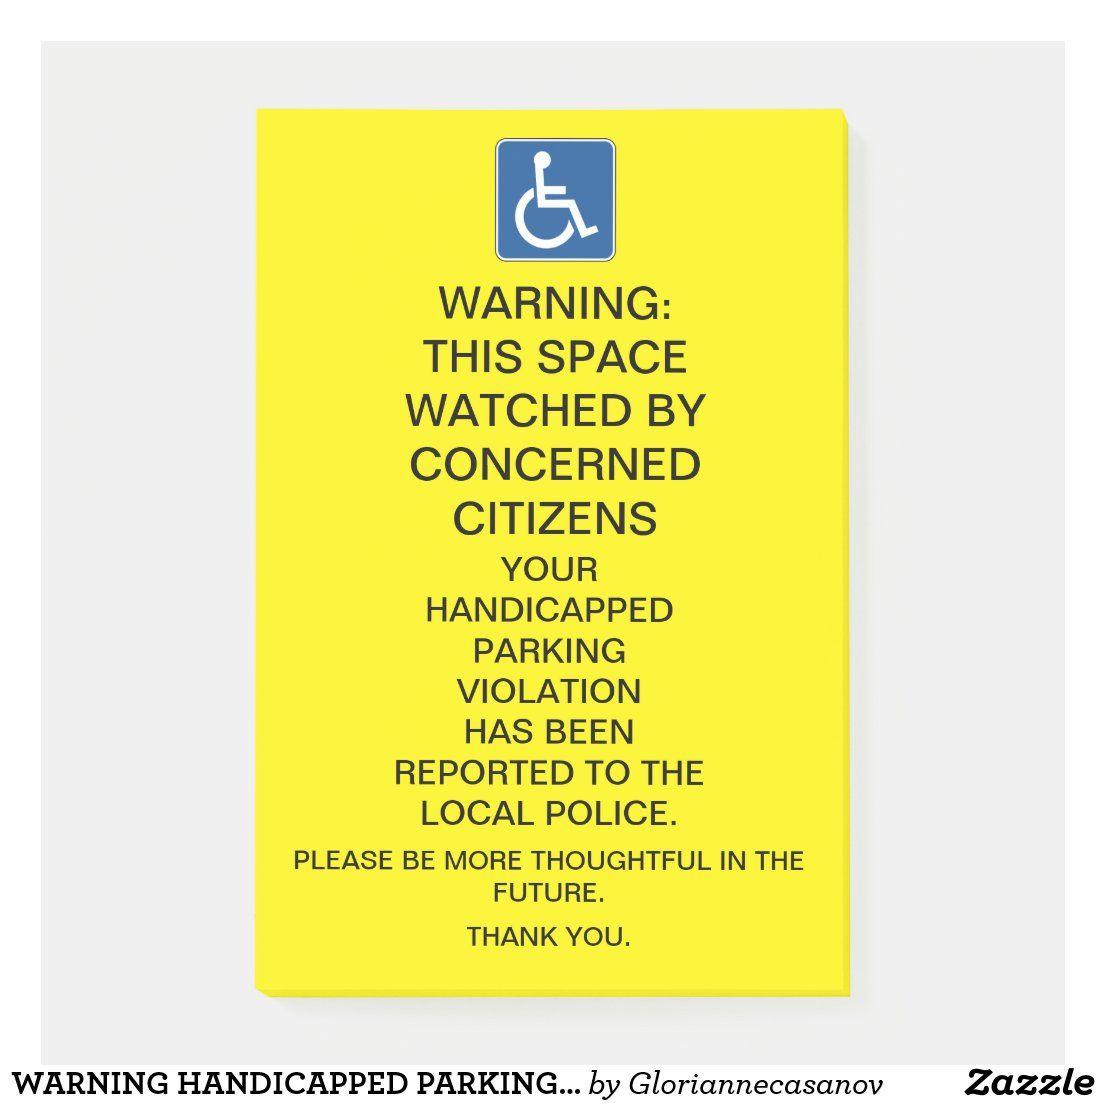 Warning Handicapped Parking Violation Sign Post It Notes Zazzle Com Post It Notes Sign Post Custom Holiday Card